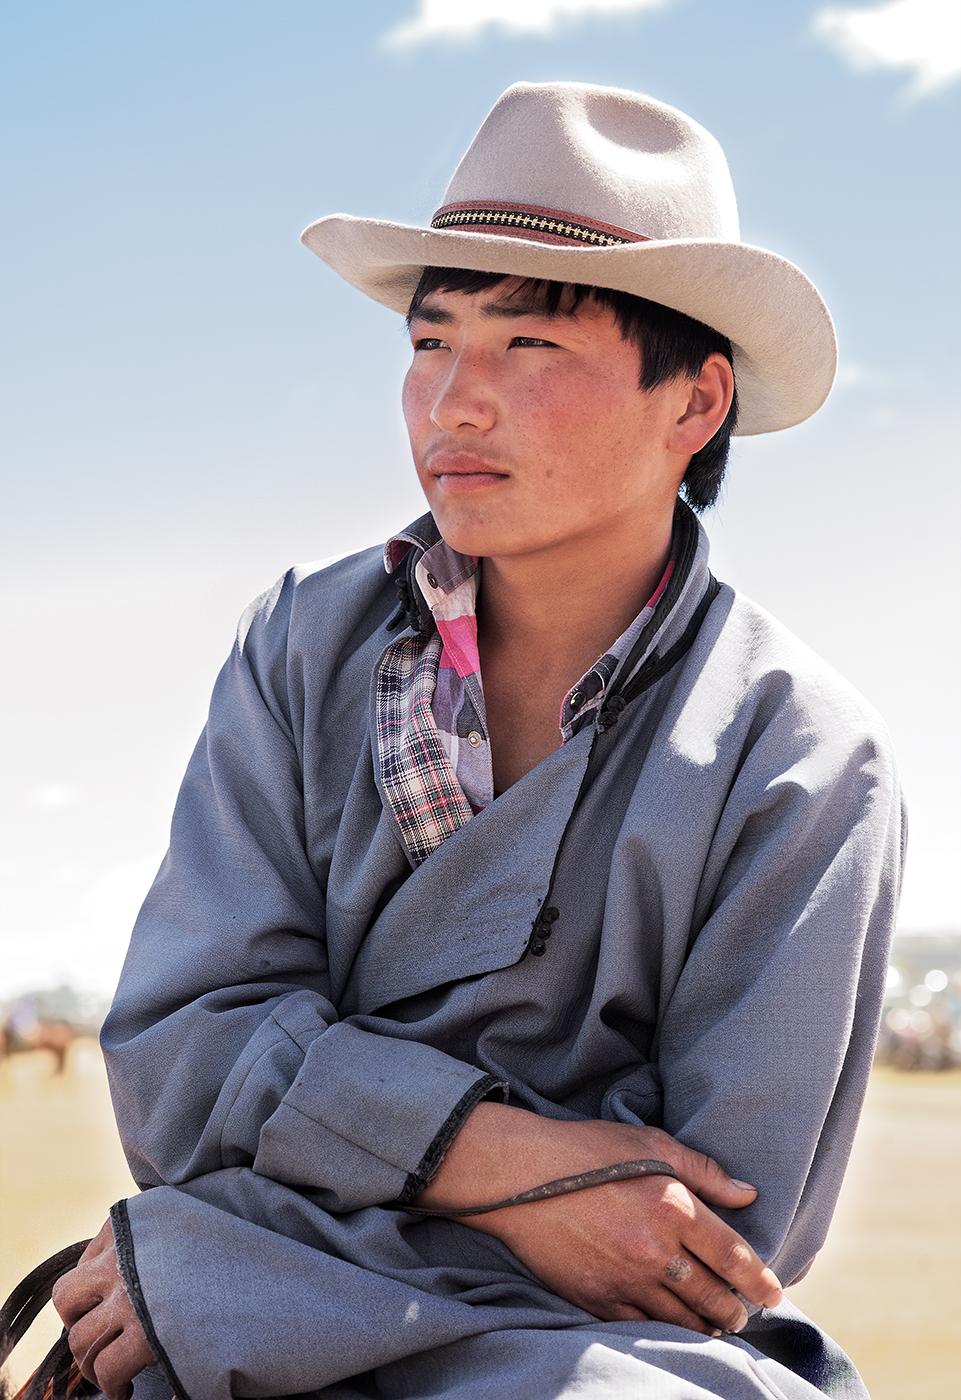 Mongolian Cowboy at Rest